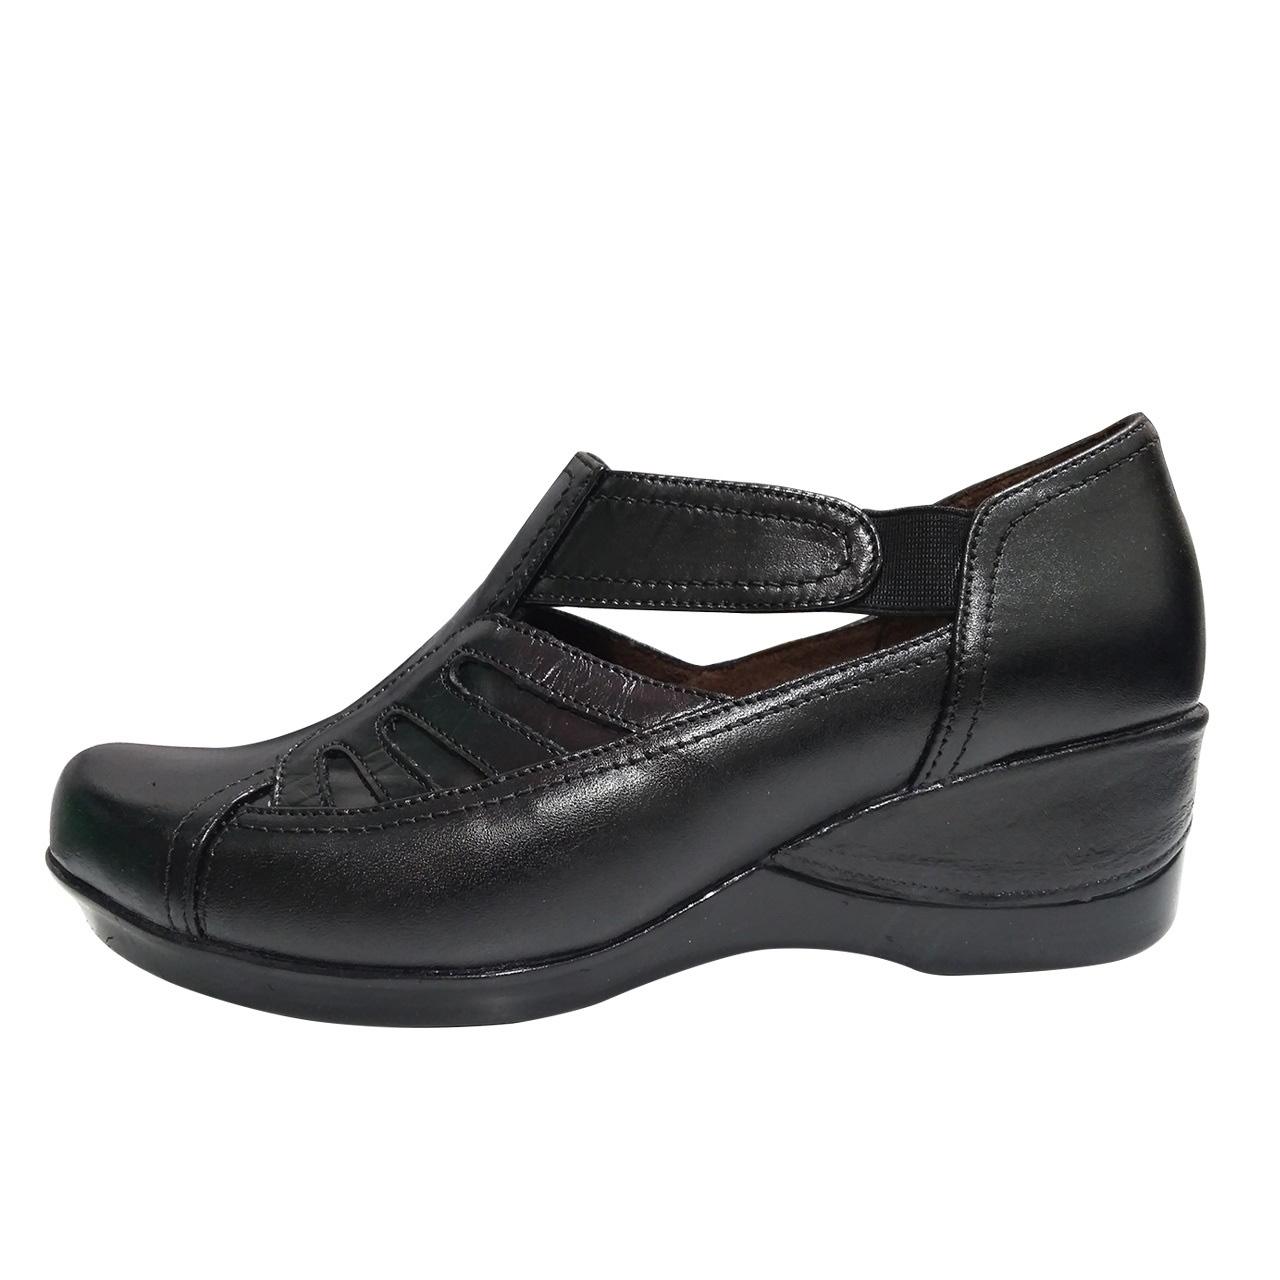 کفش زنانه روشن کد 495 |